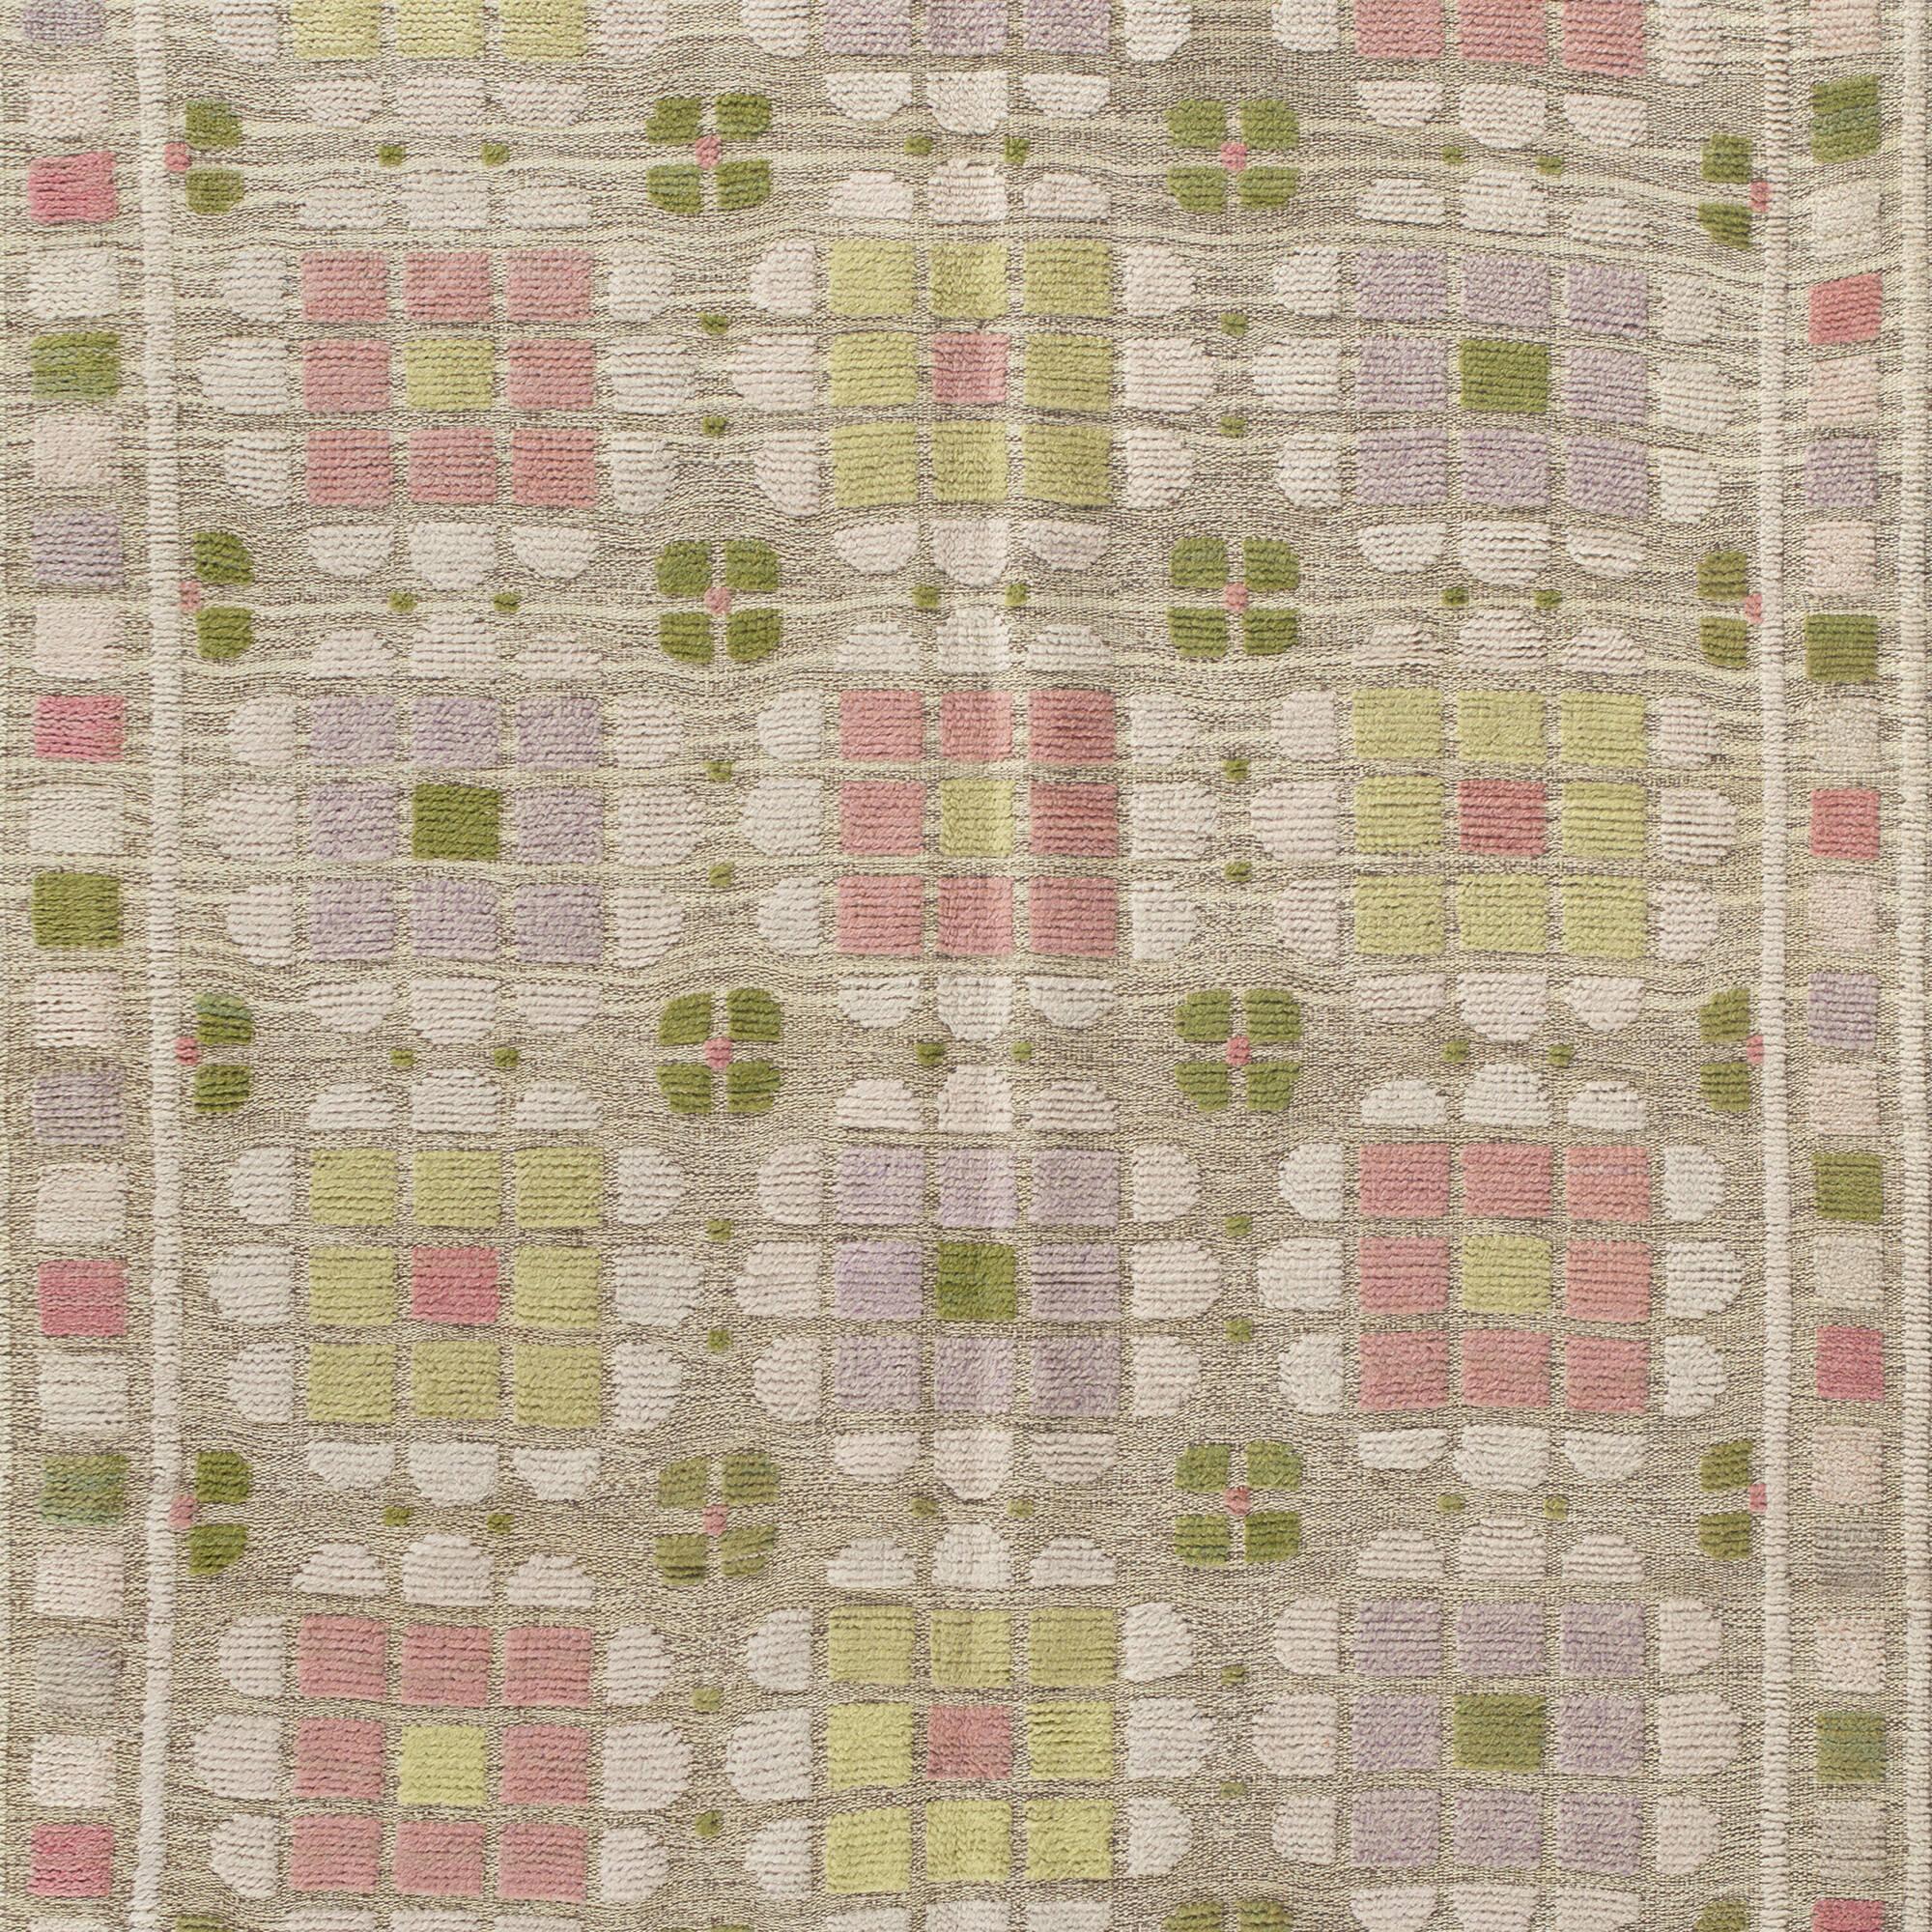 179: Märta Måås-Fjetterström / Dahlior half-pile carpet (3 of 3)